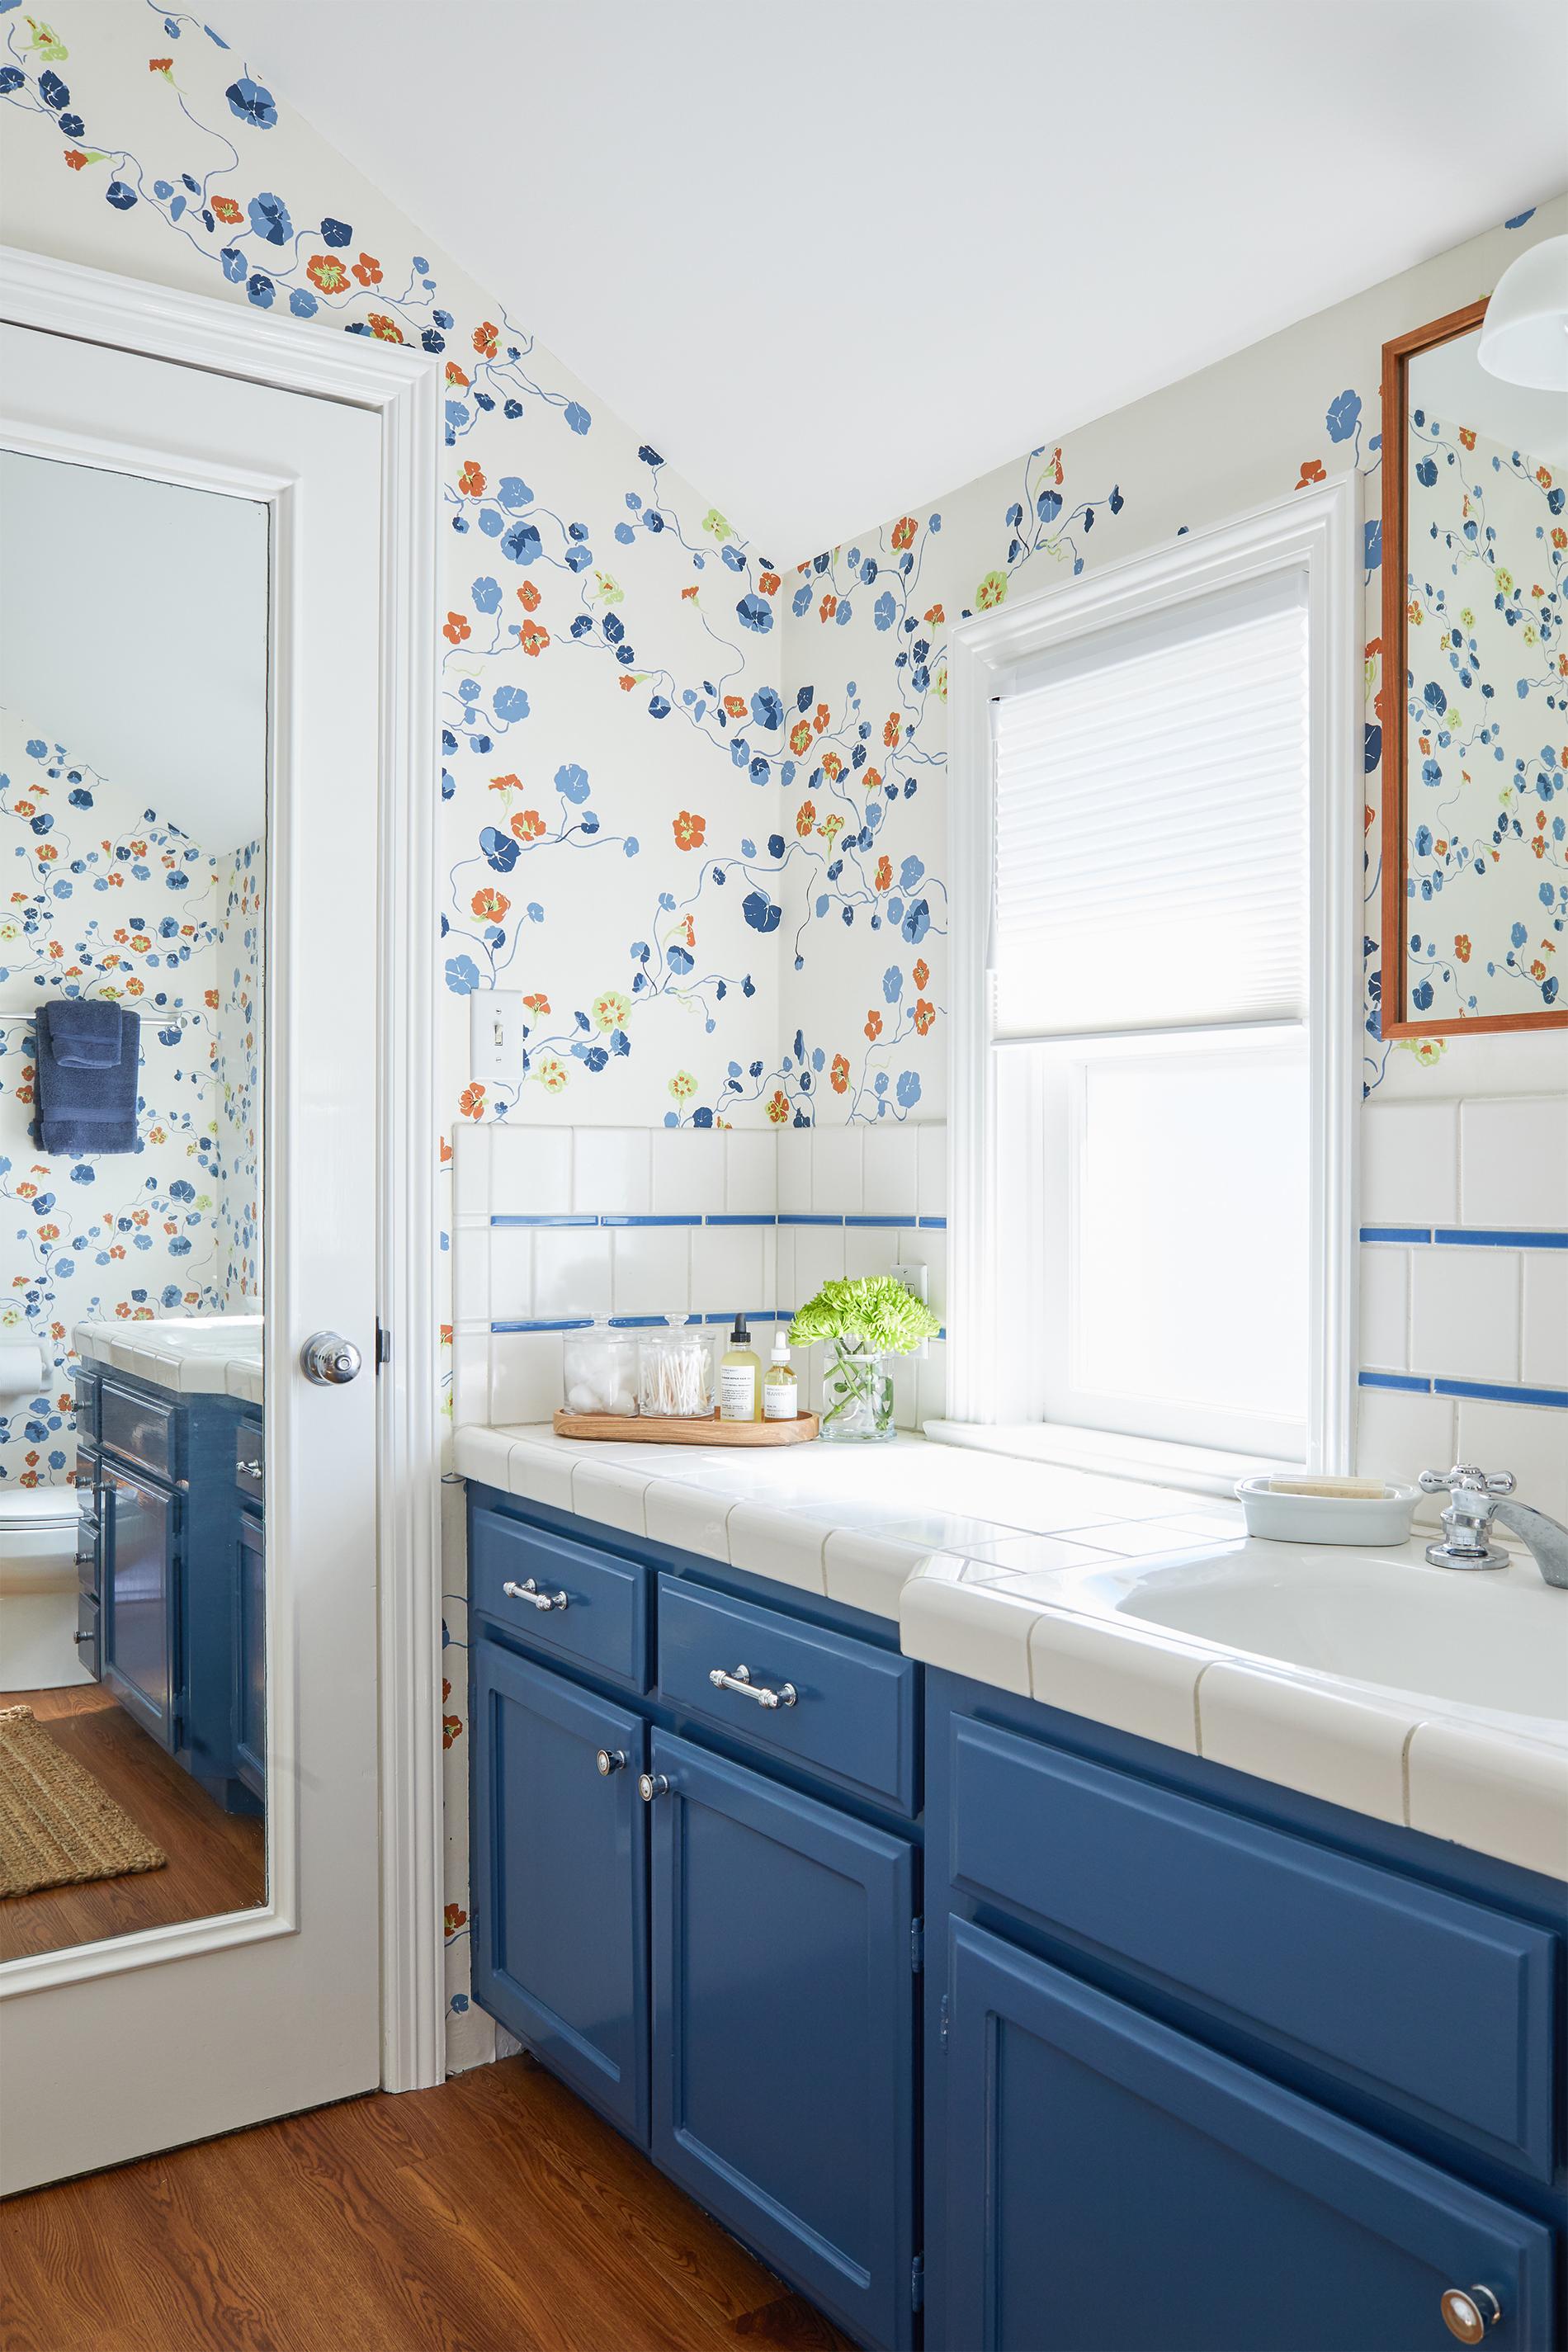 Add a Little *pop* to your Bathroom Routine  xo, Ebright Design